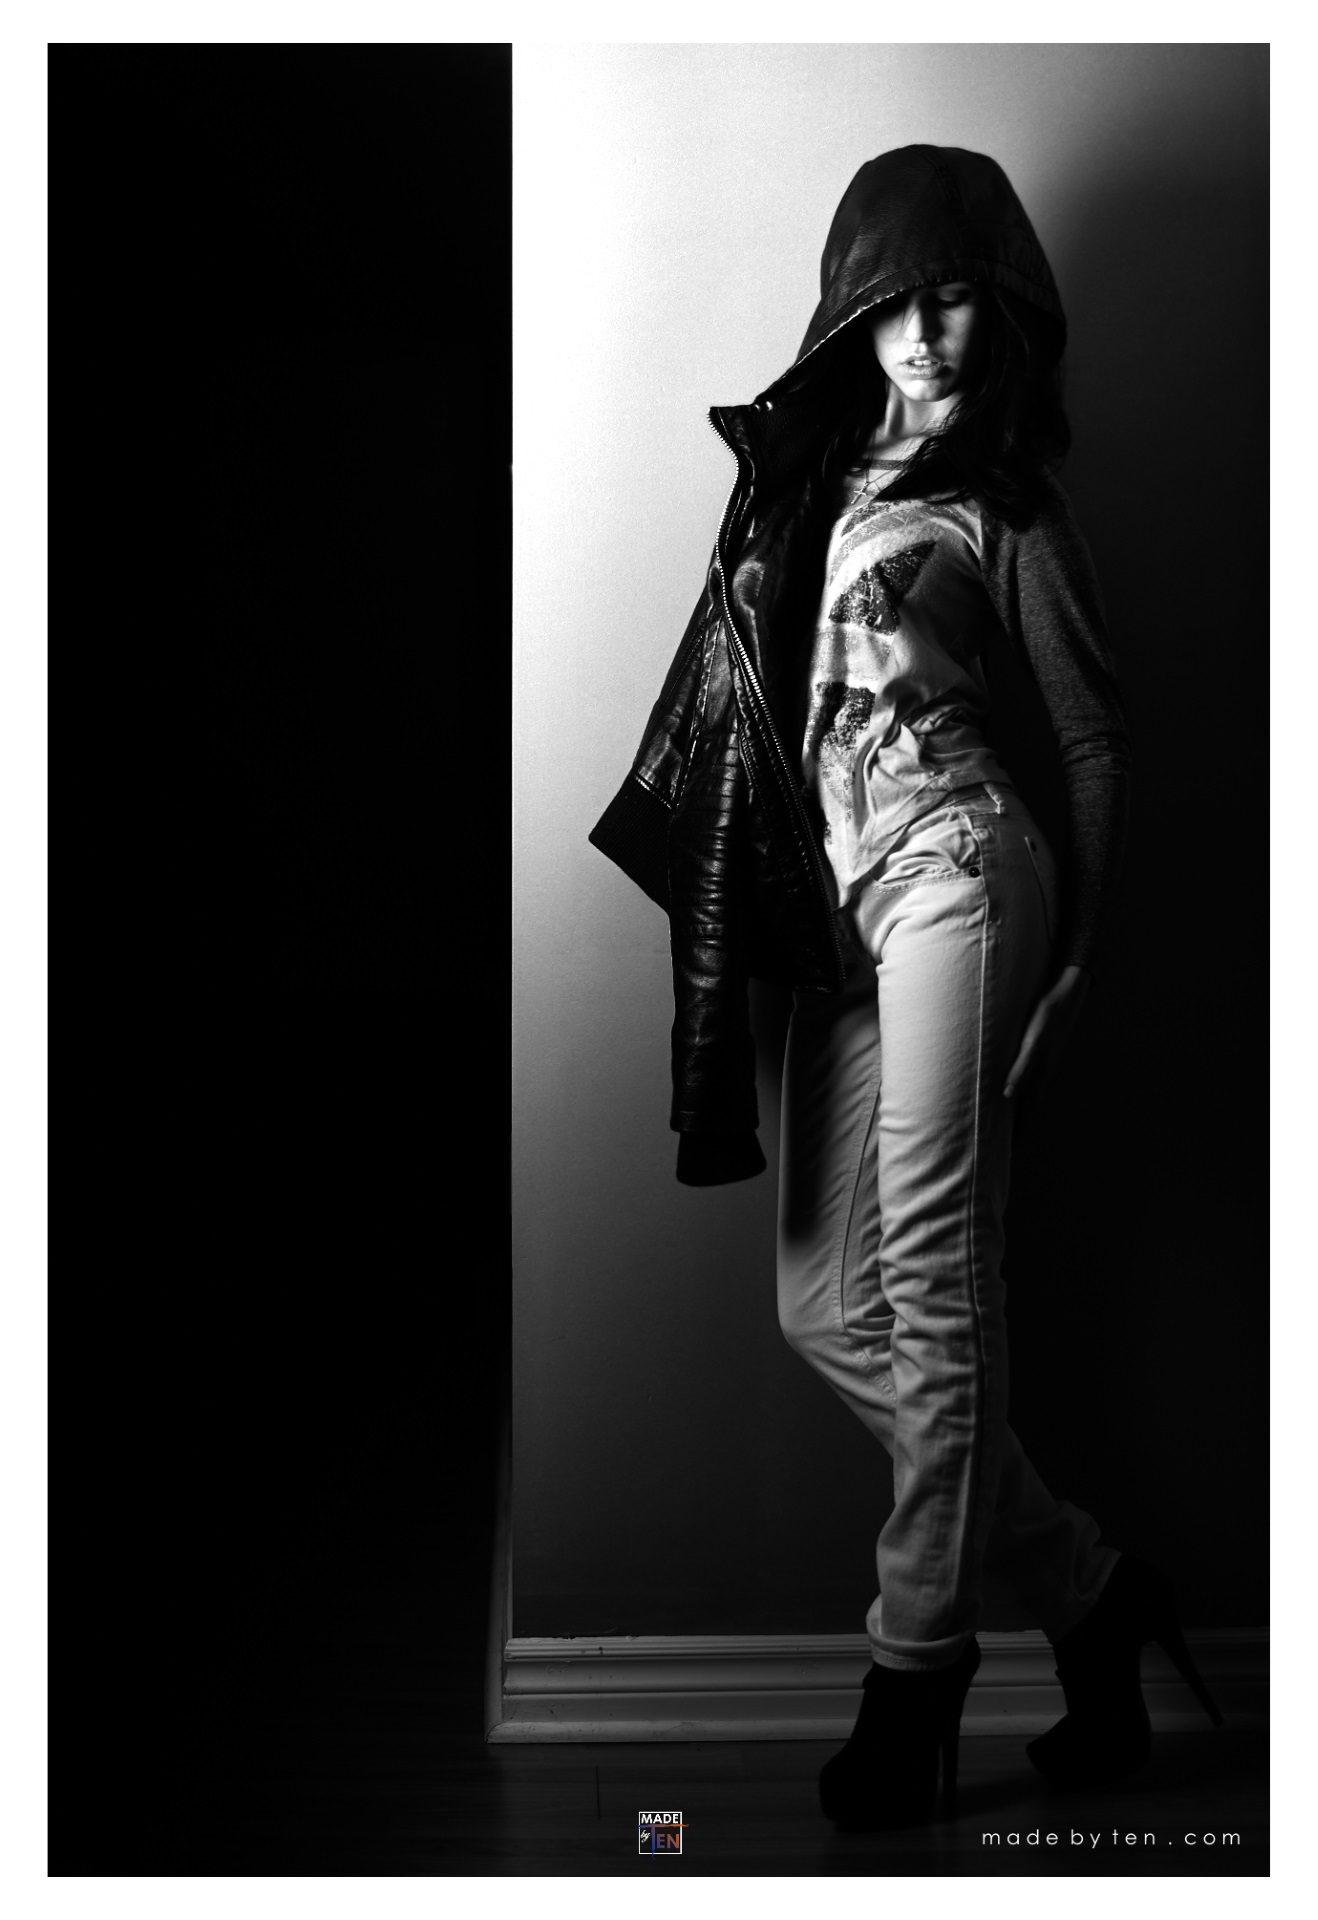 Woman Modern Fashion - GTA Women Lifestyle Photography